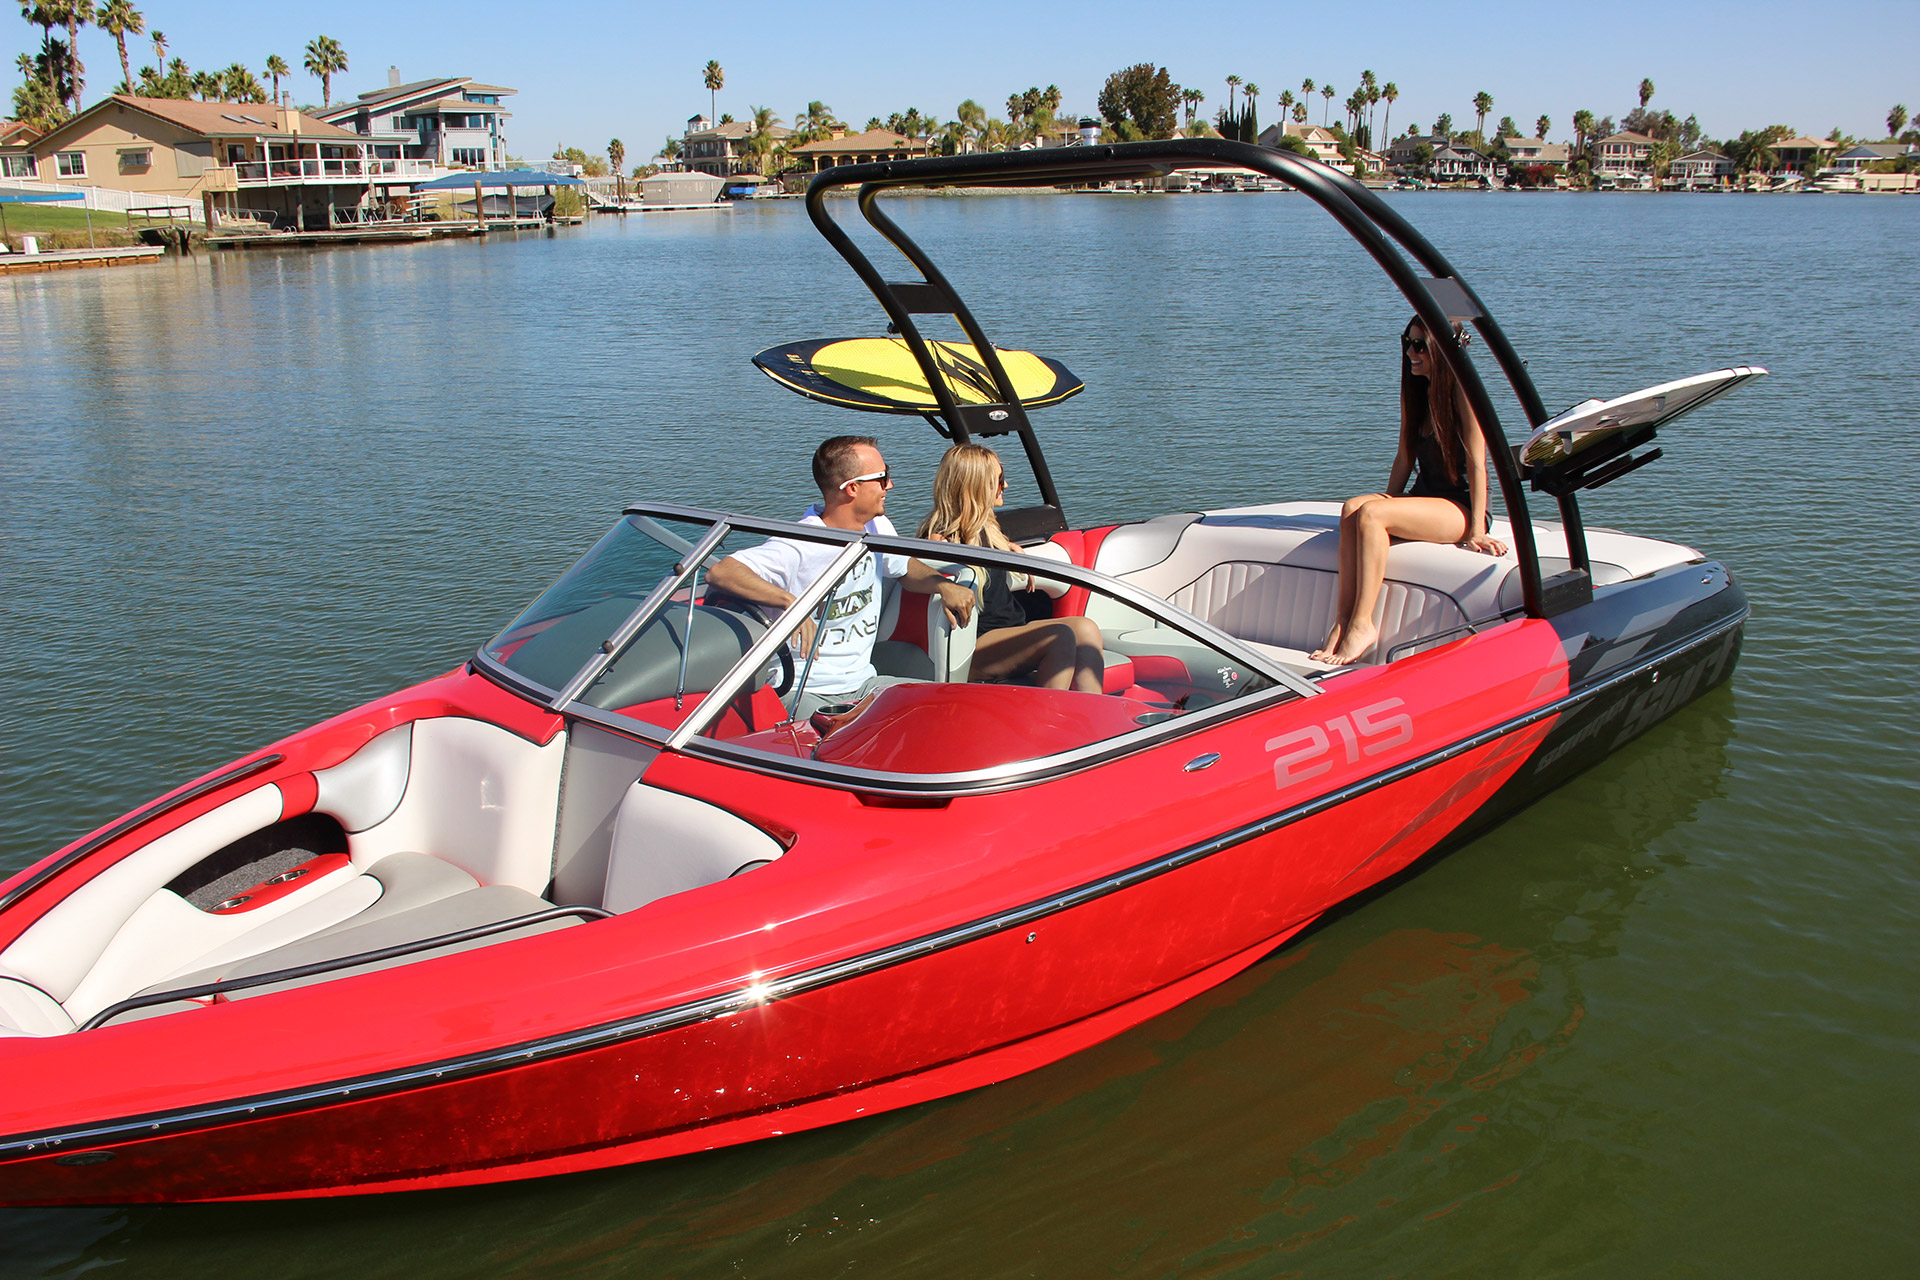 Sanger V215 S Wakesurf Wakeboard Boats Sanger Boats